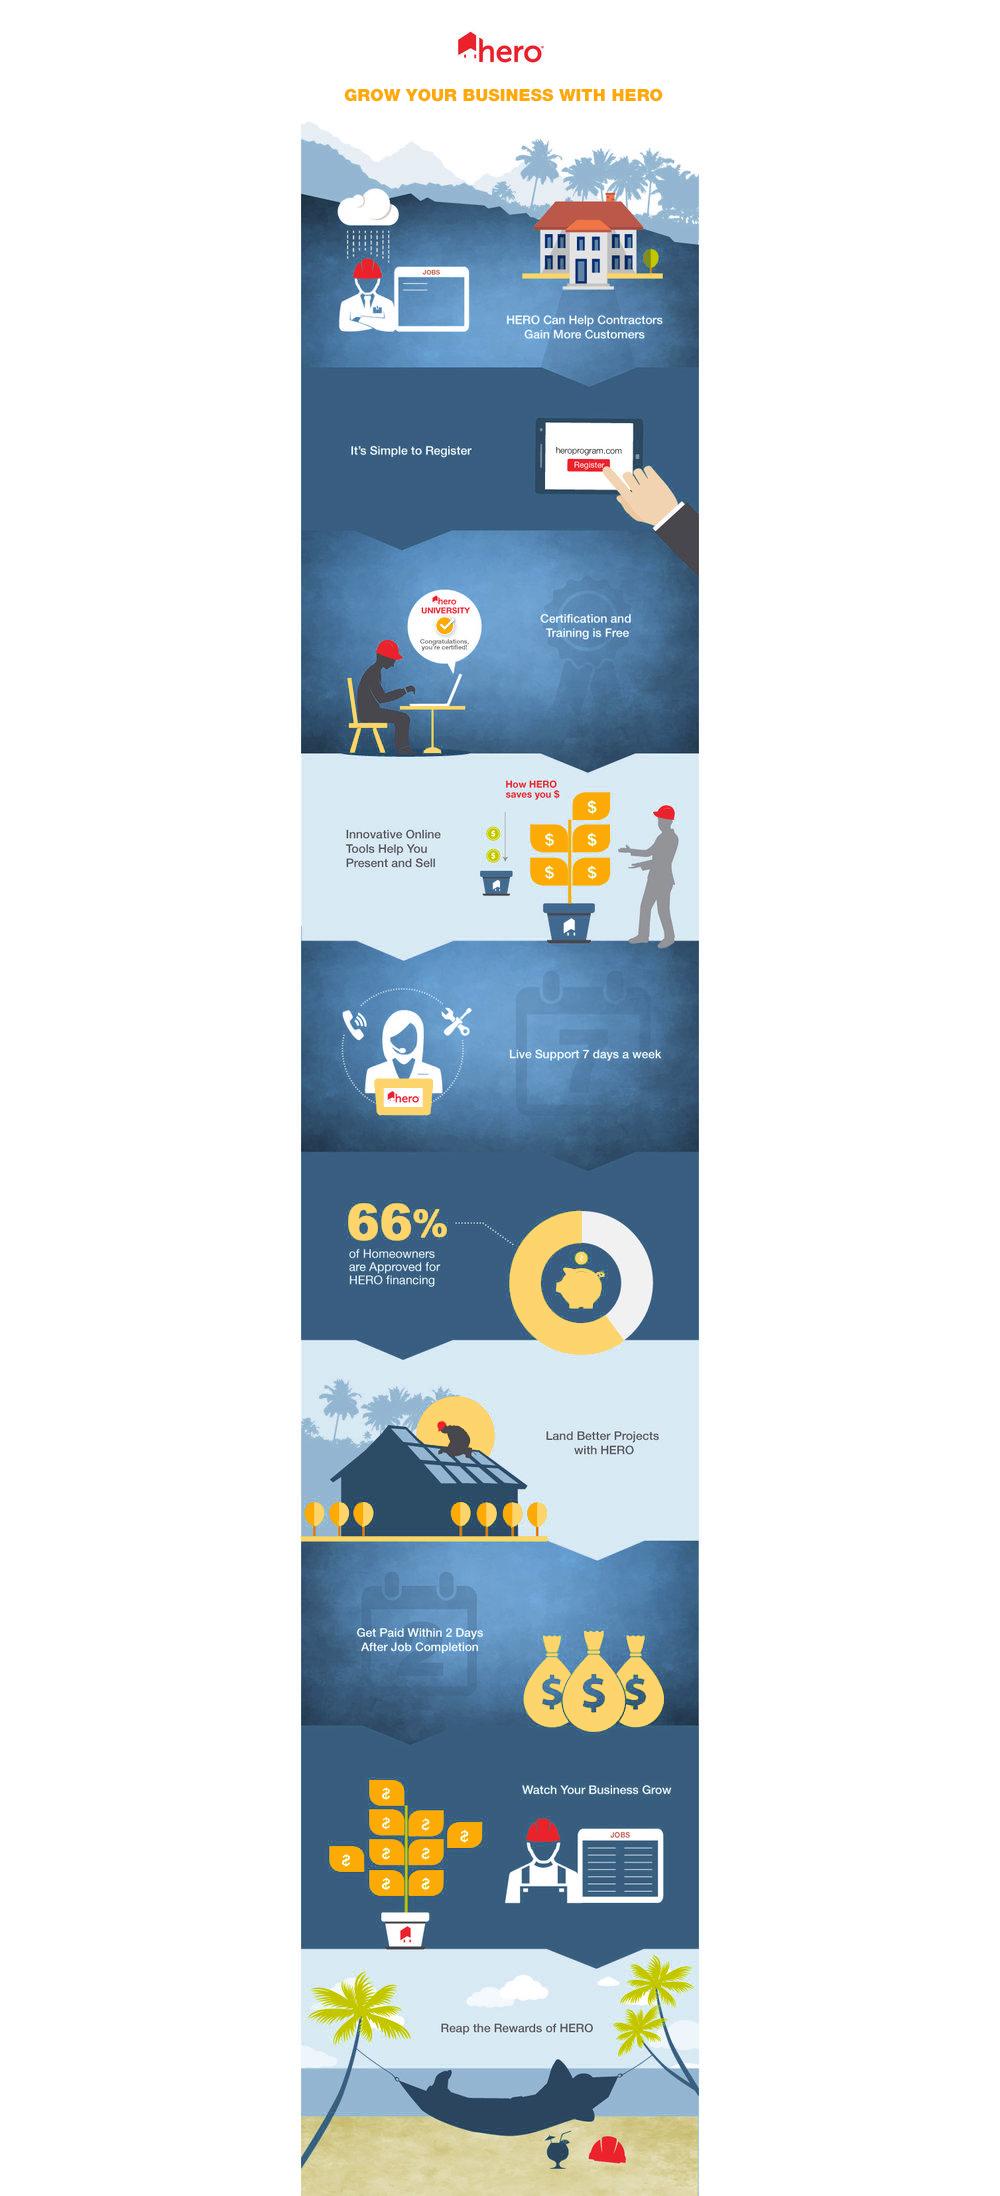 infographic3.jpg